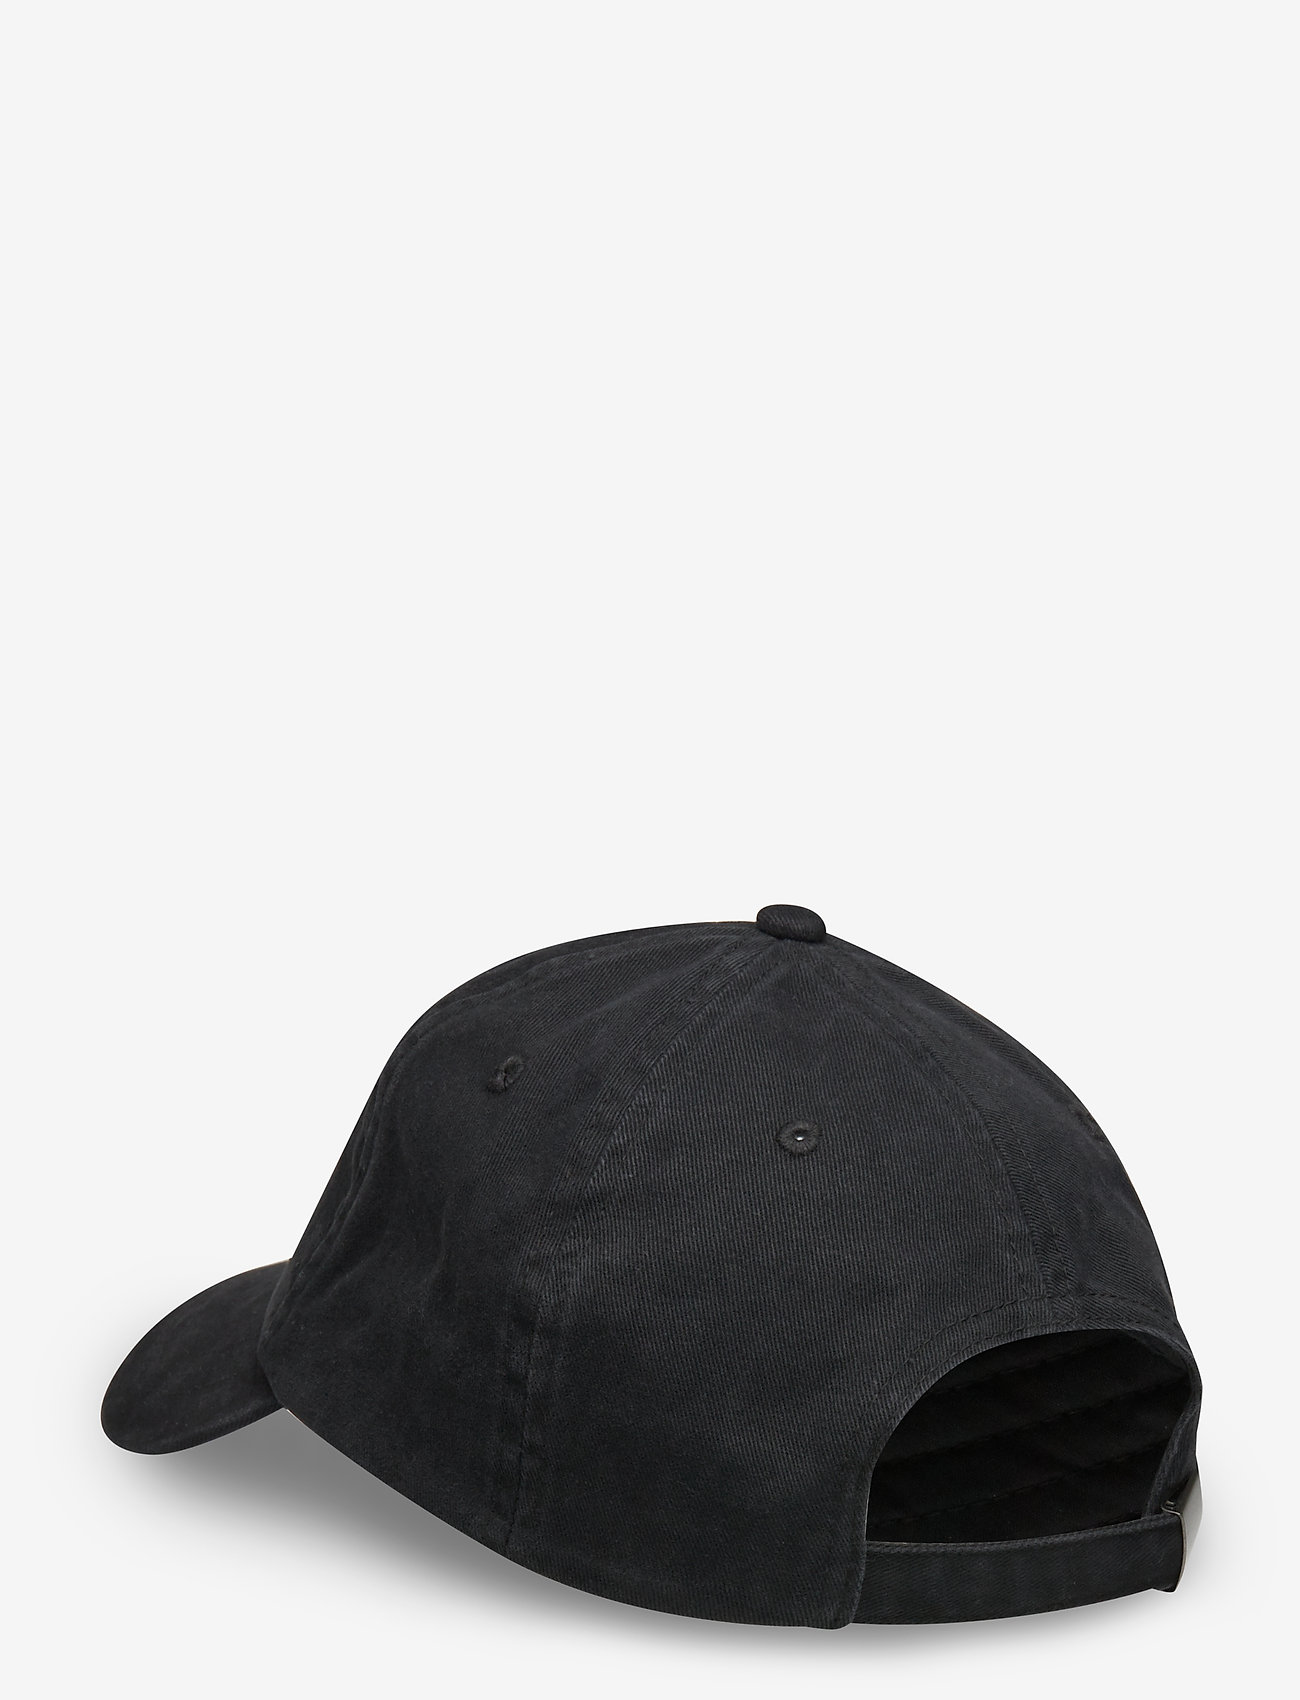 HAN Kjøbenhavn - Cotton Cap - petten - black logo - 1